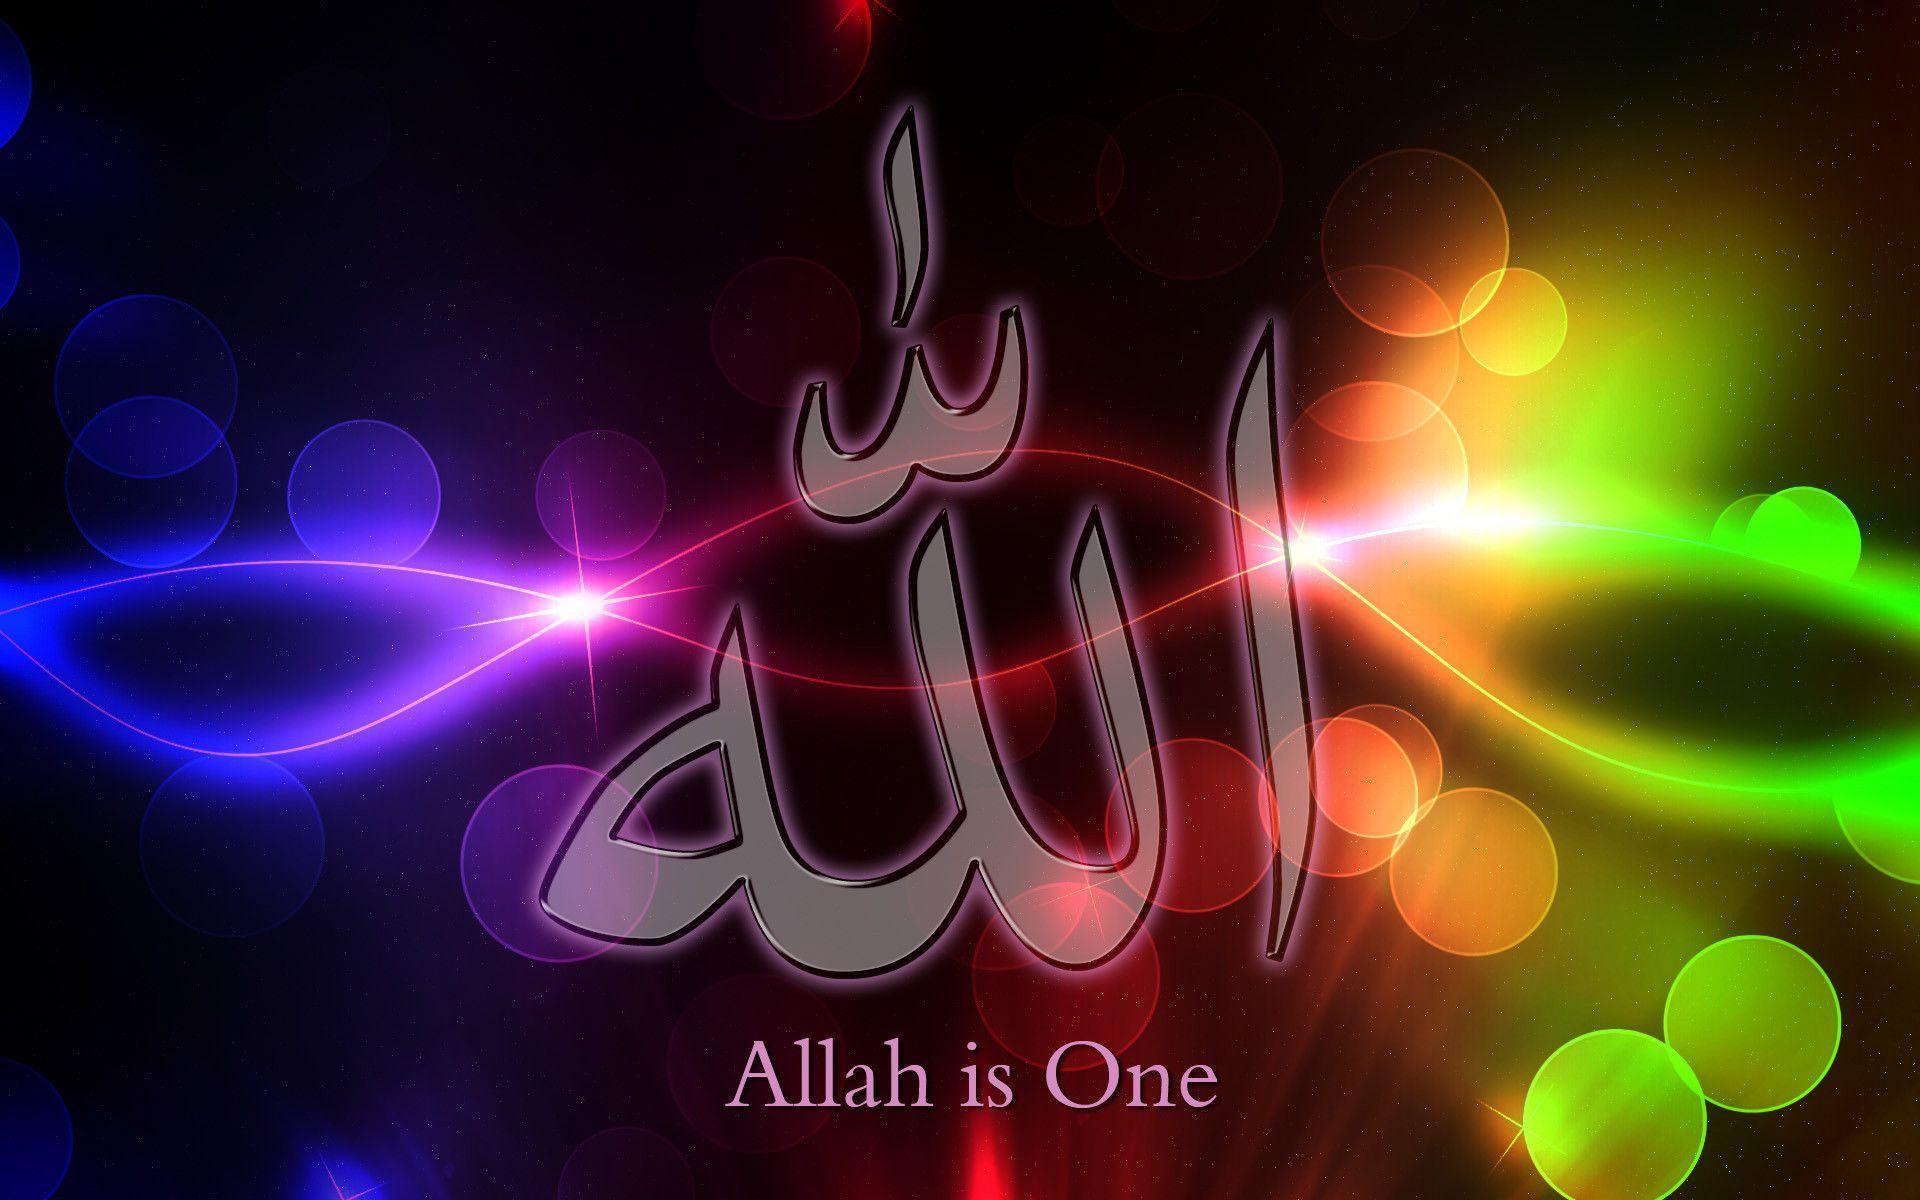 Allah Wallpapers - Full HD wallpaper search